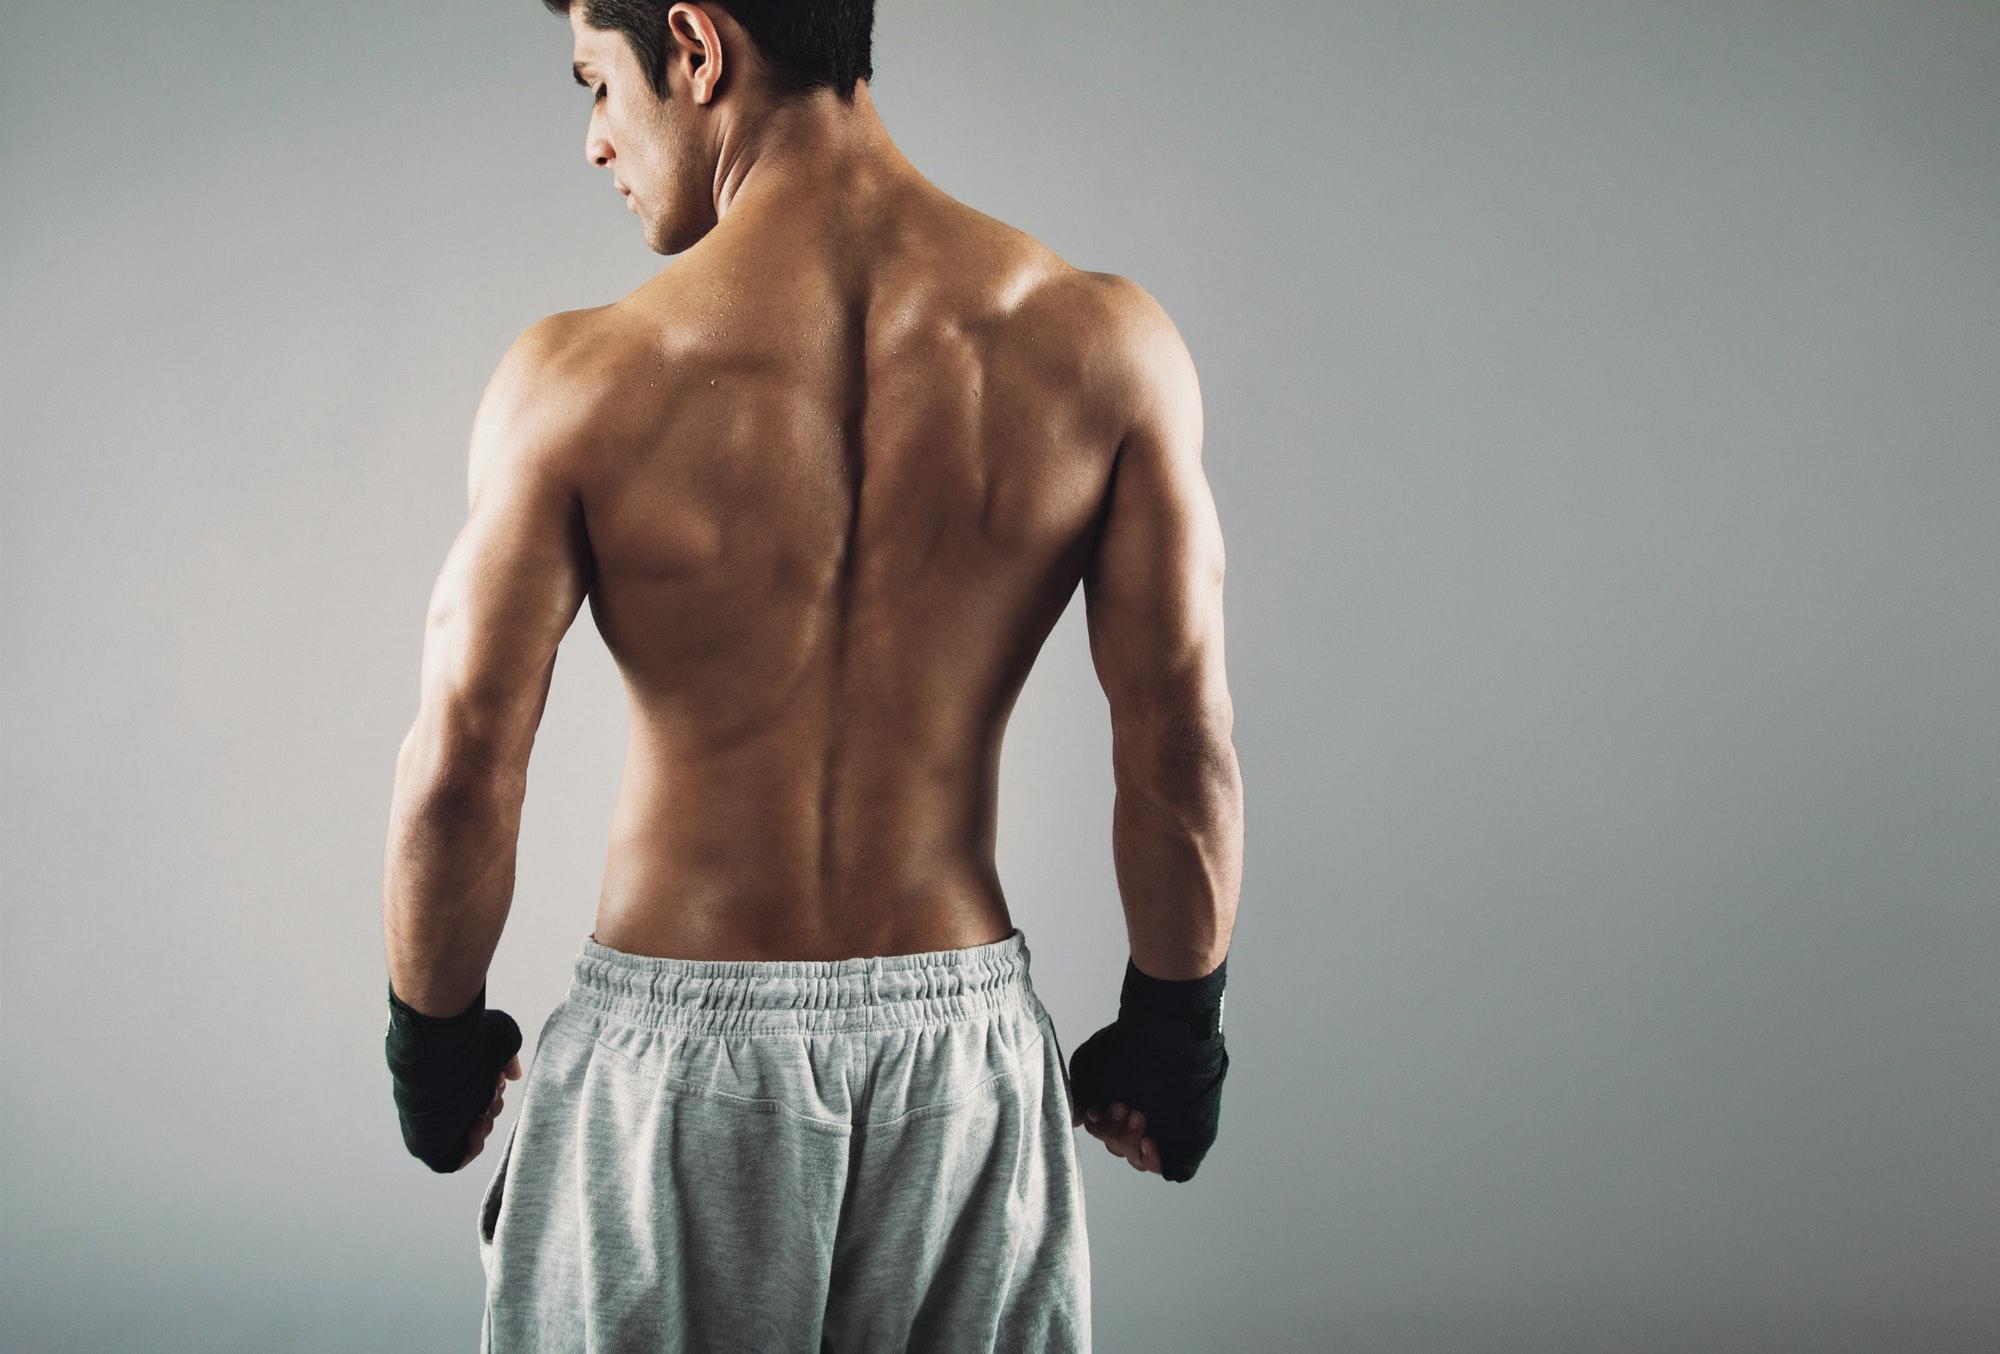 træning overkrop